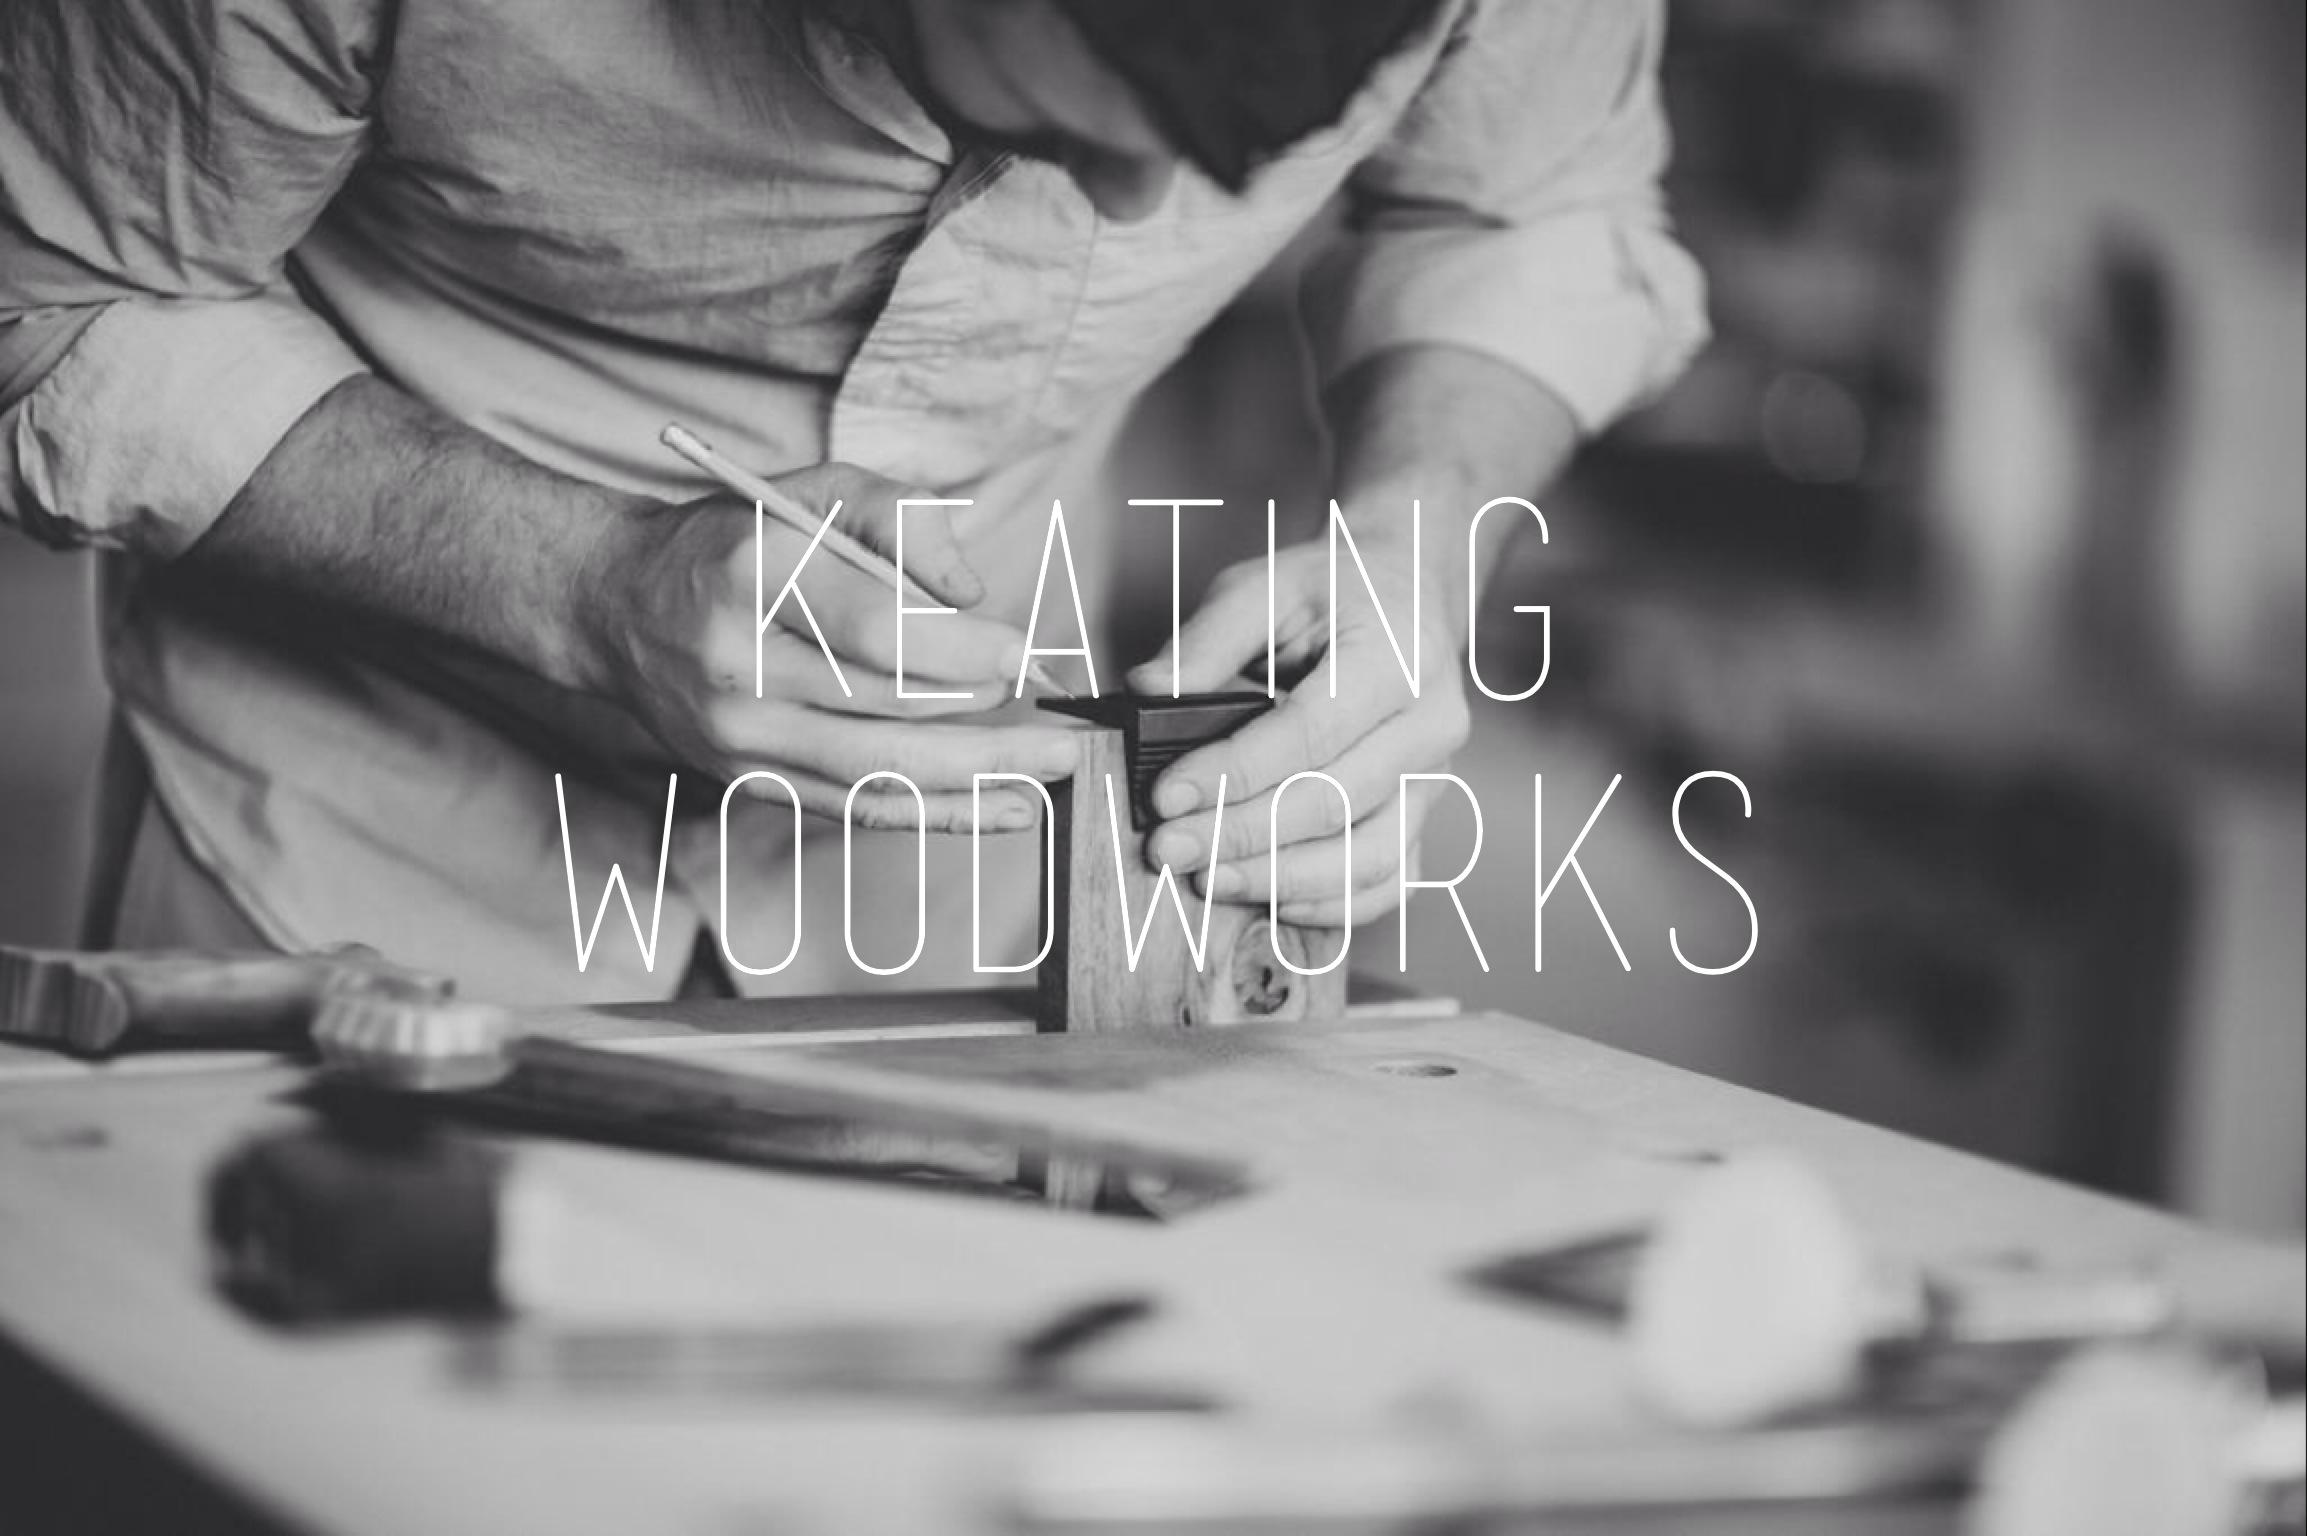 Keating Woodworks